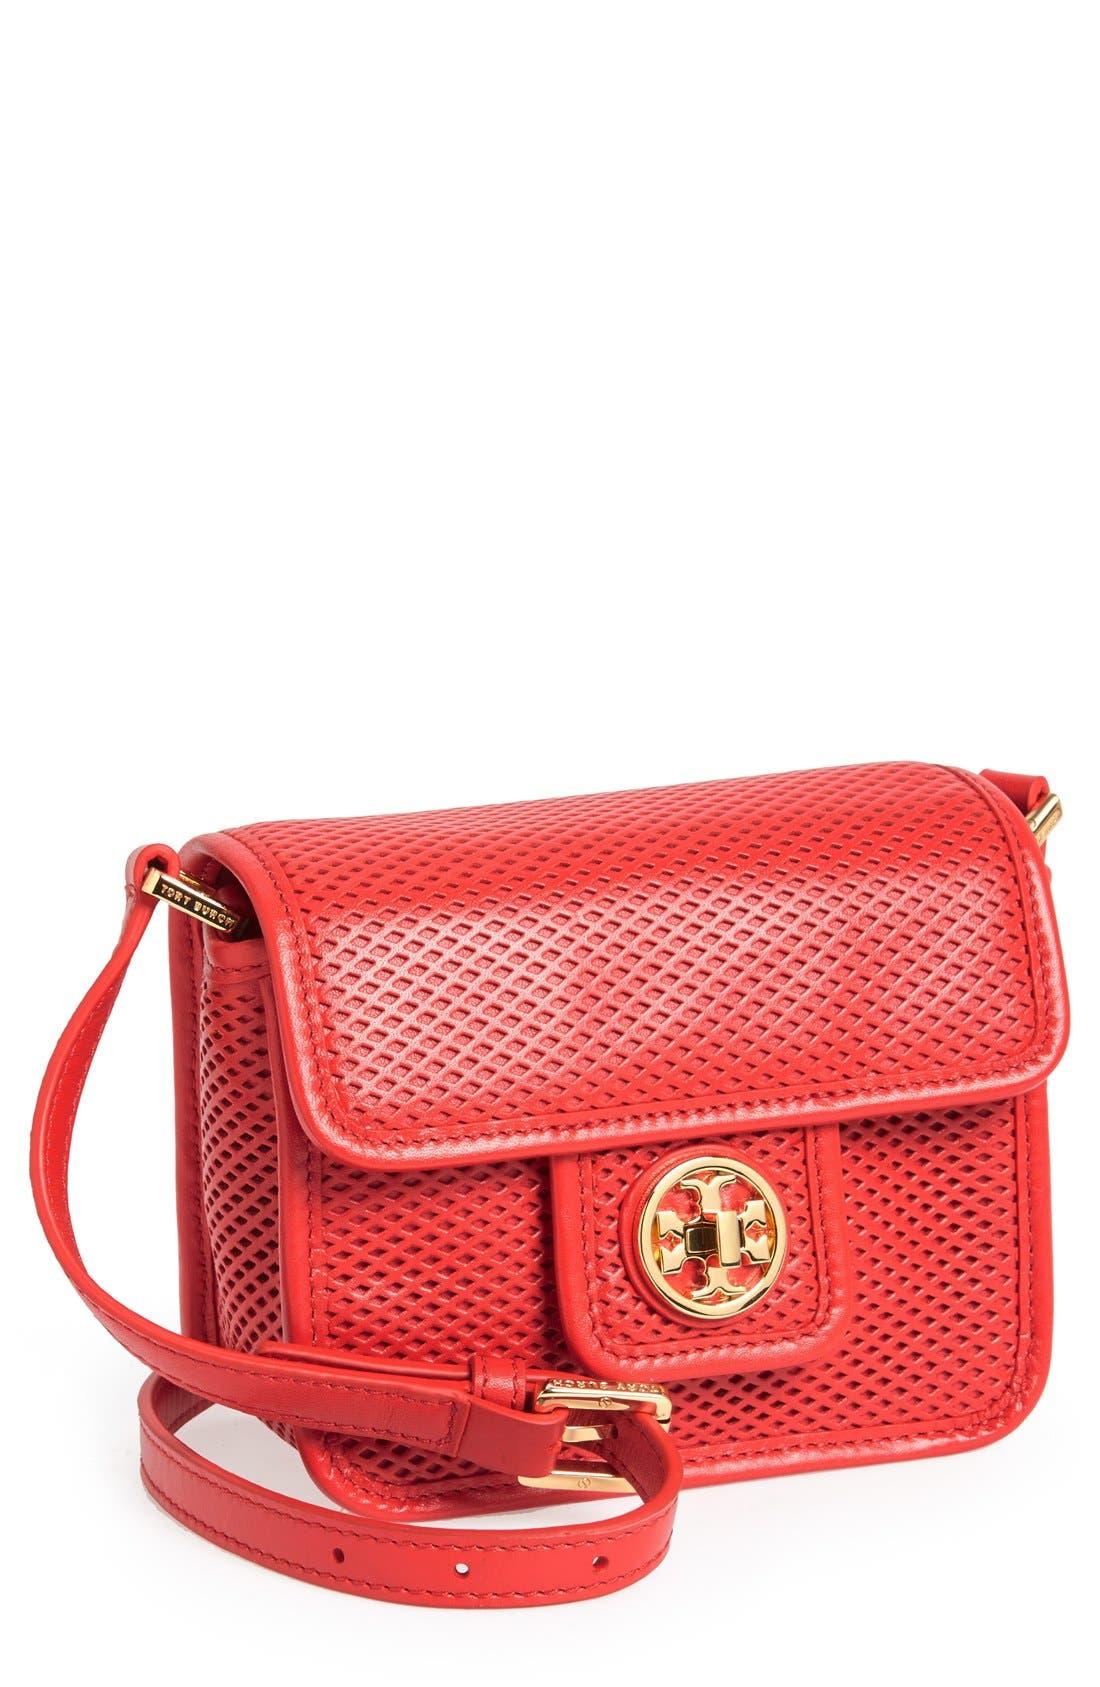 Alternate Image 1 Selected - Tory Burch 'Mini Harper' Leather Crossbody Bag